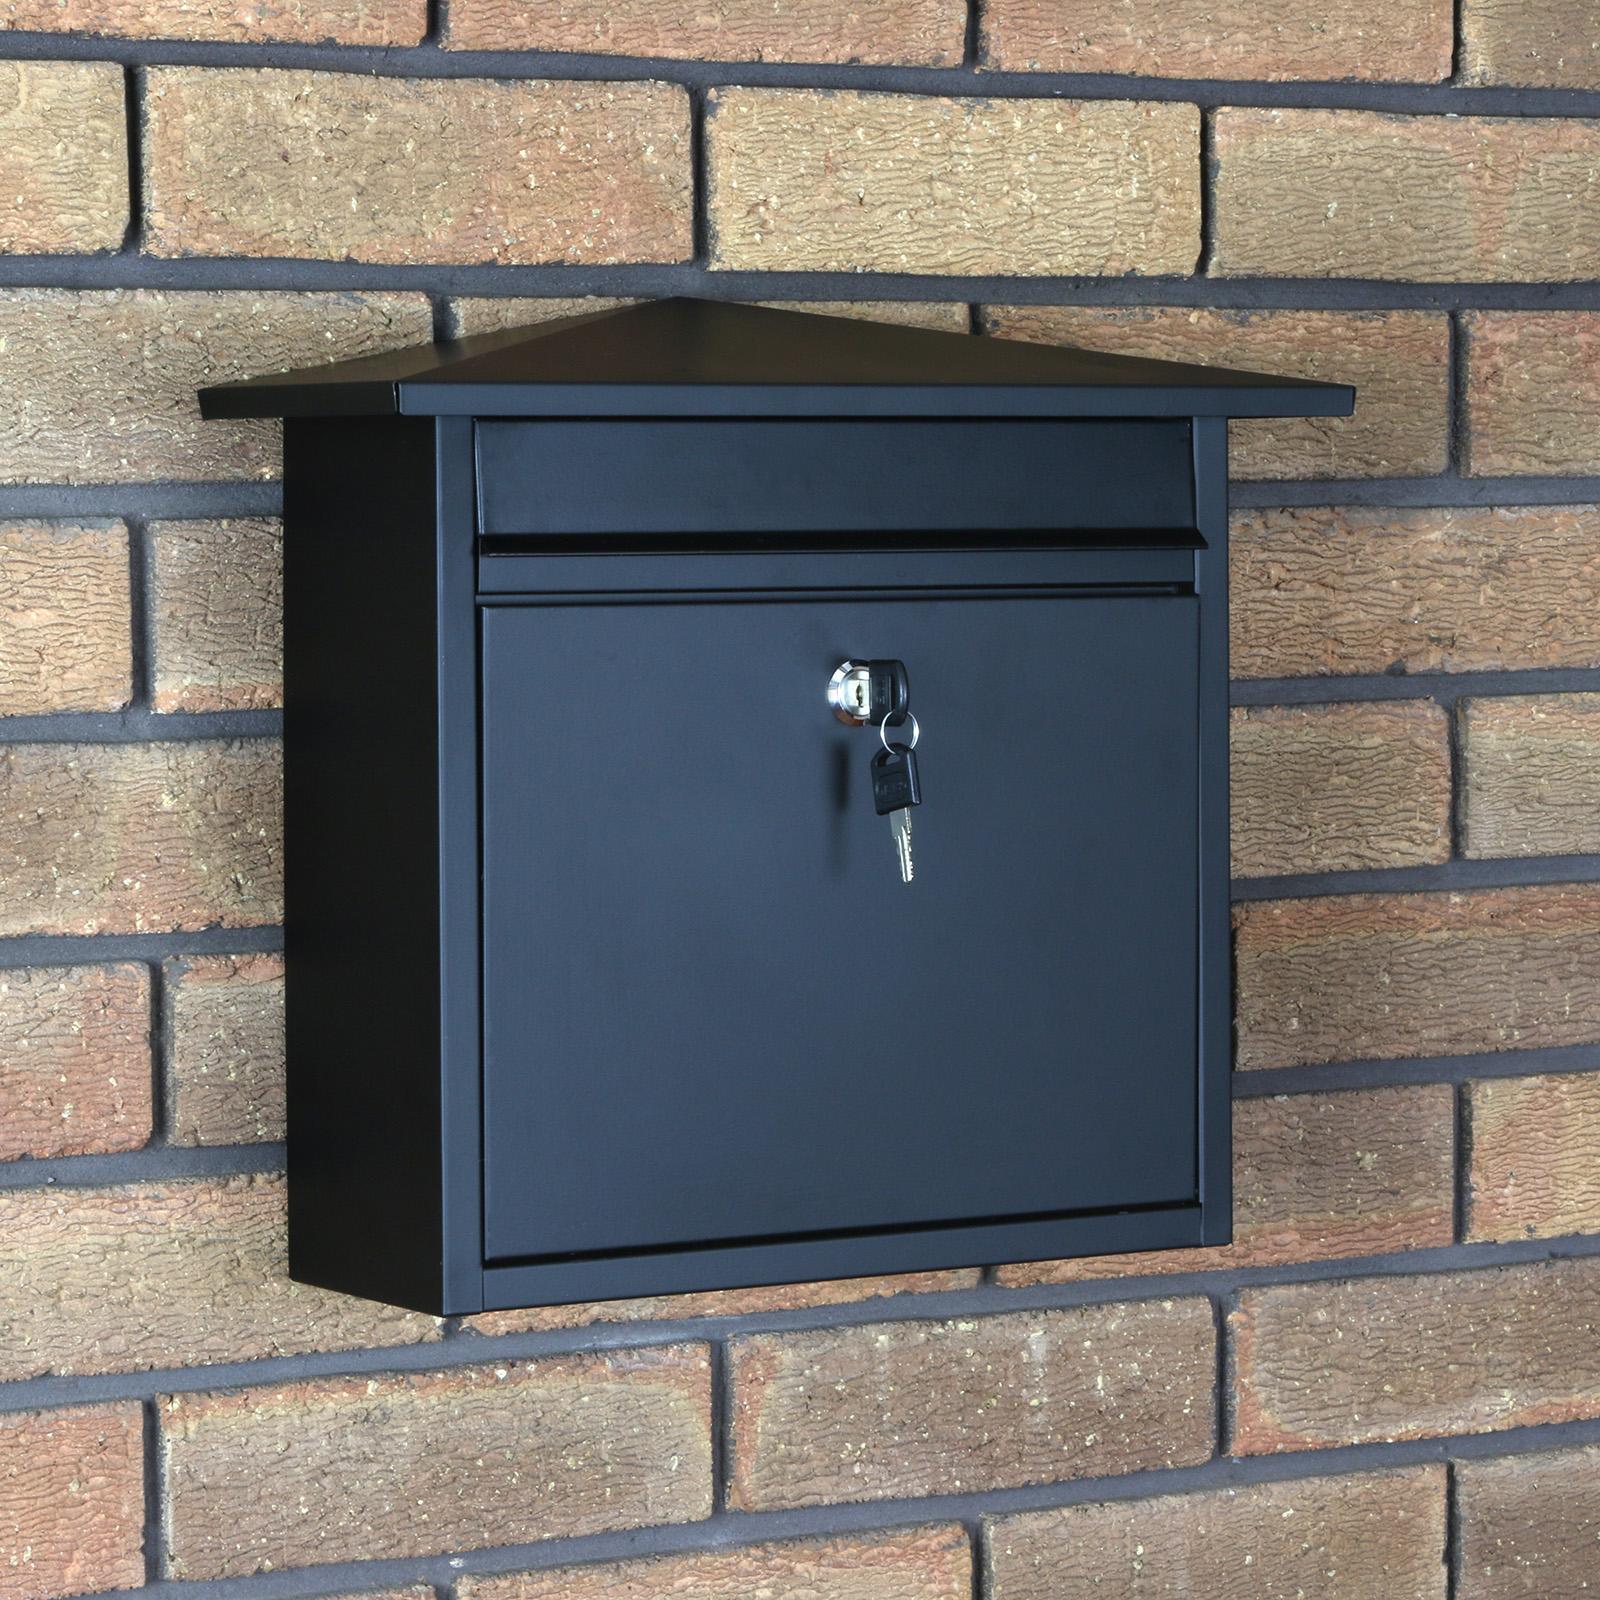 Matt Black Lockable Mailbox Postbox Outdoor Home Wall Mail